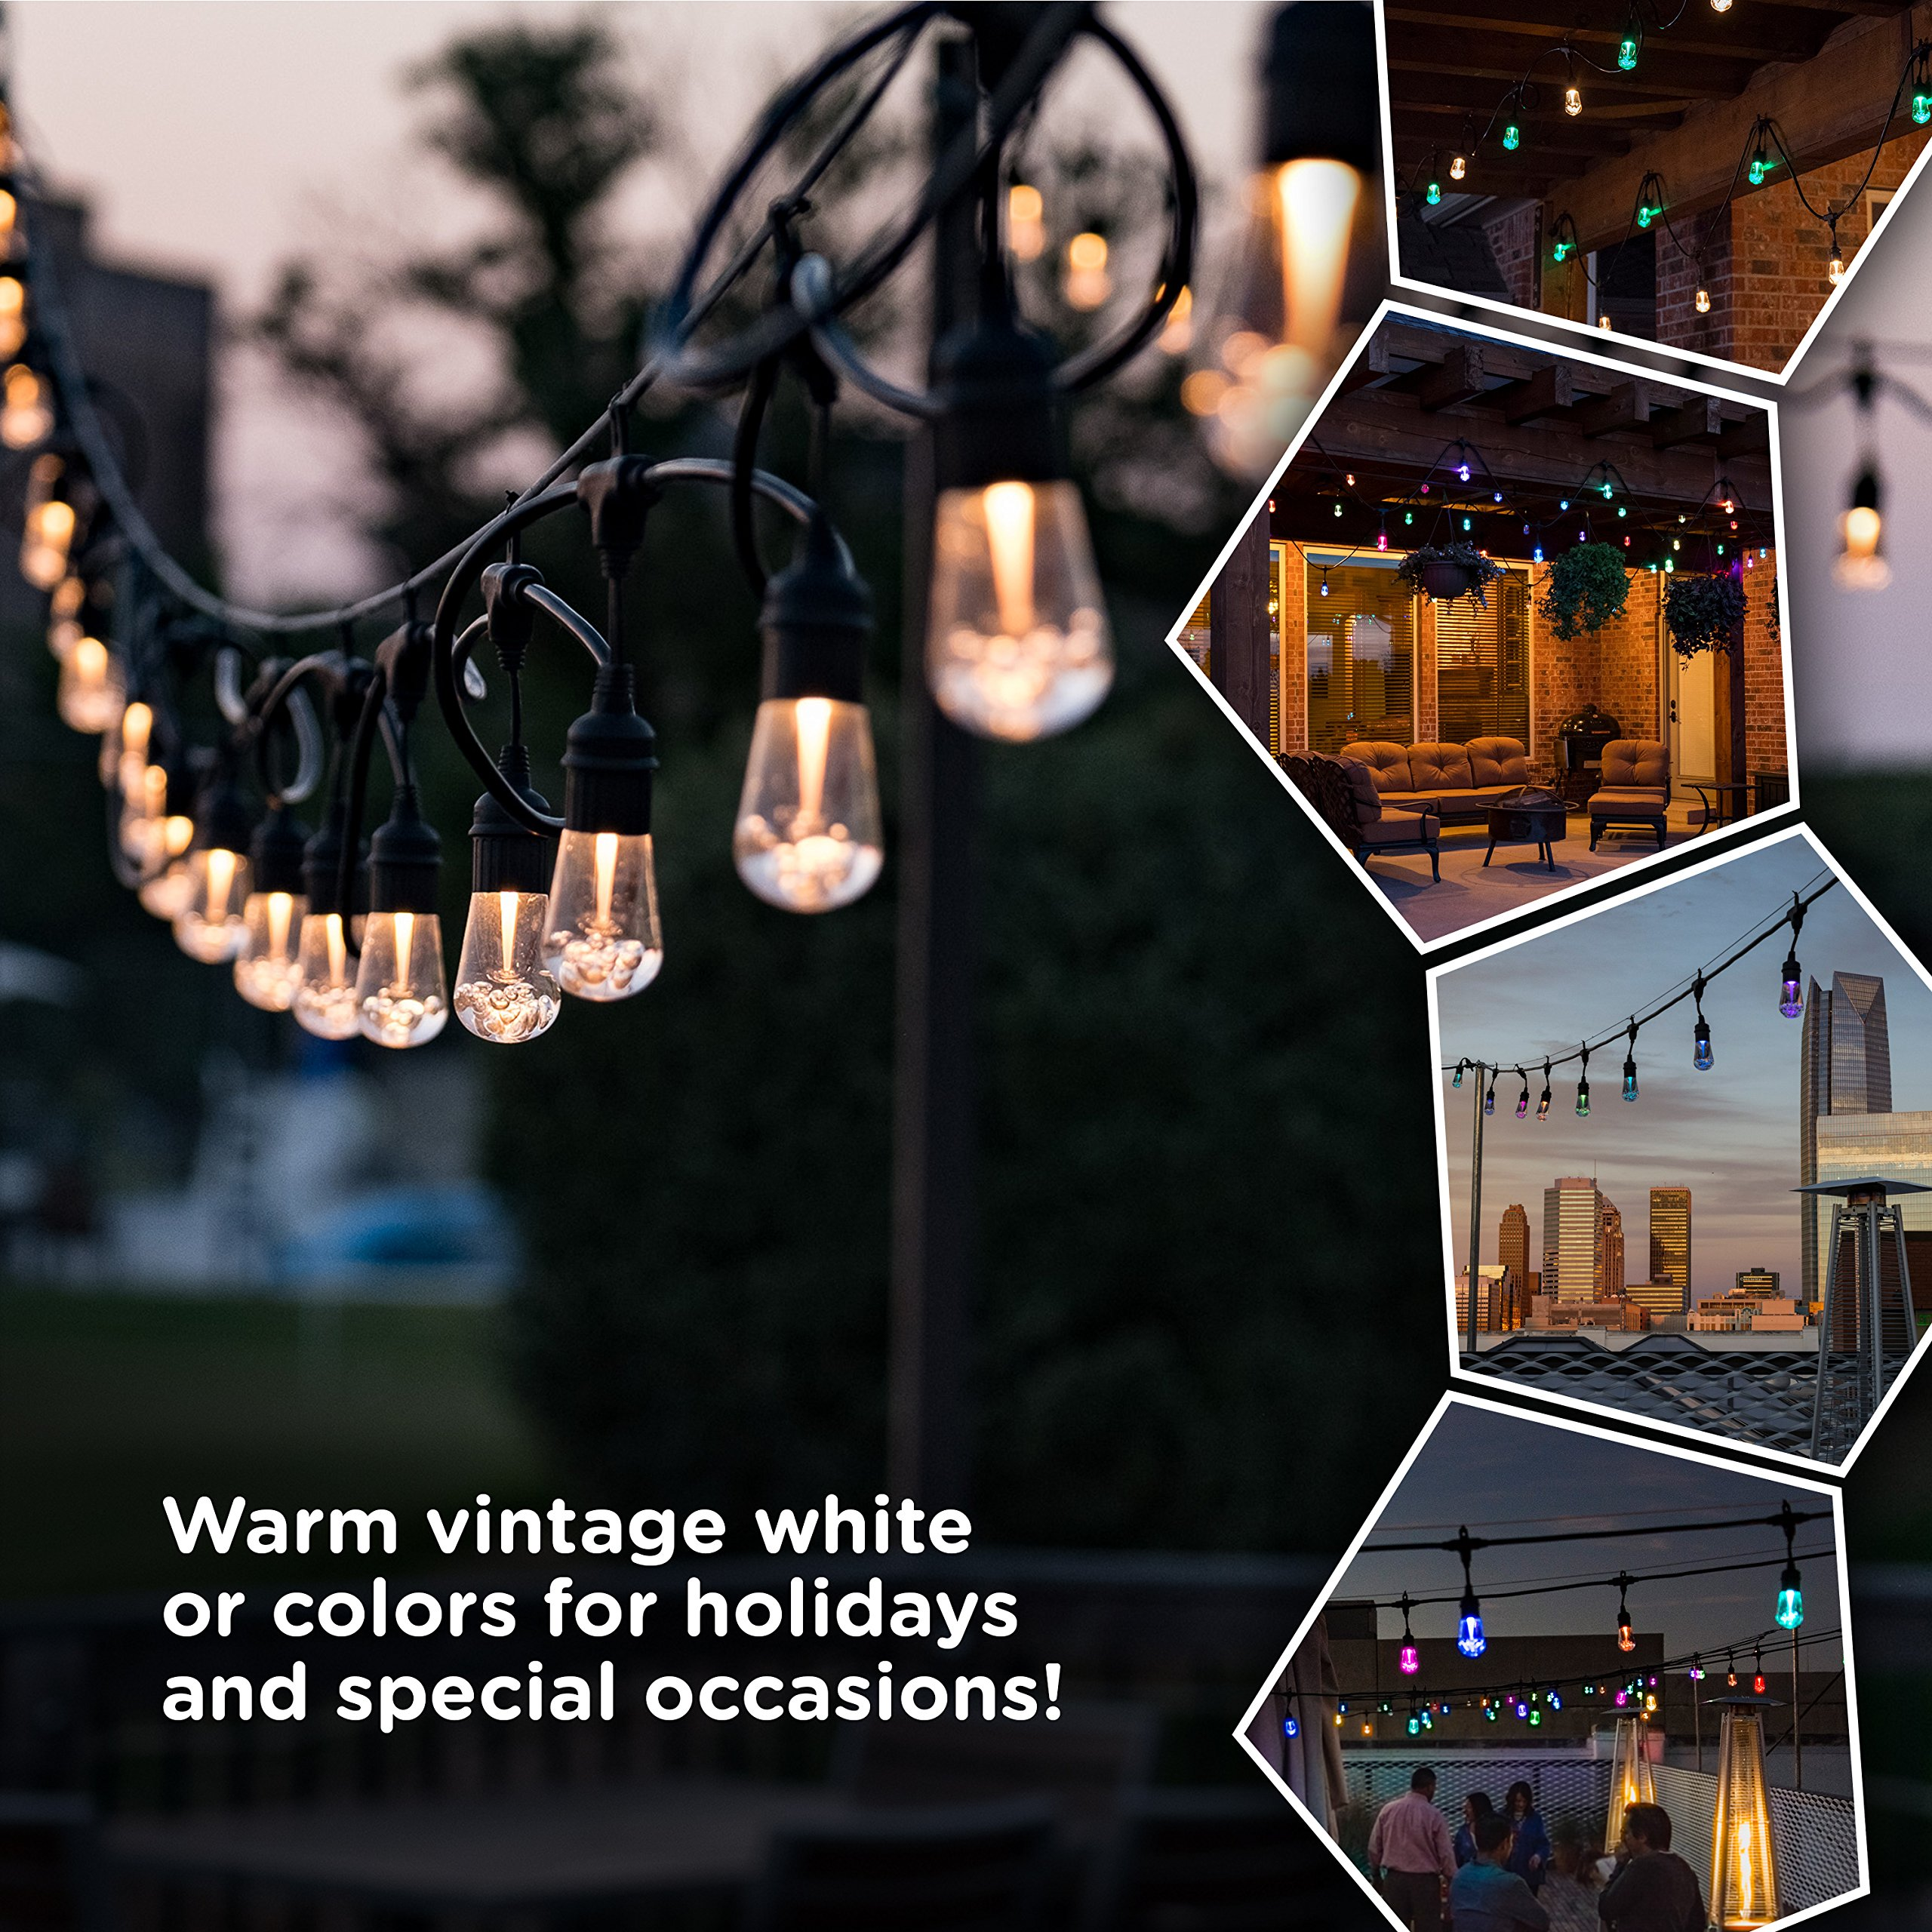 Enbrighten 37790 Vintage Seasons LED Warm White & Color Changing Café String Lights, Black, 48ft, 24 Premium Impact Resistant Lifetime Bulbs, Wireless, Weatherproof, Indoor/Outdoor, 48 ft, by Enbrighten (Image #3)